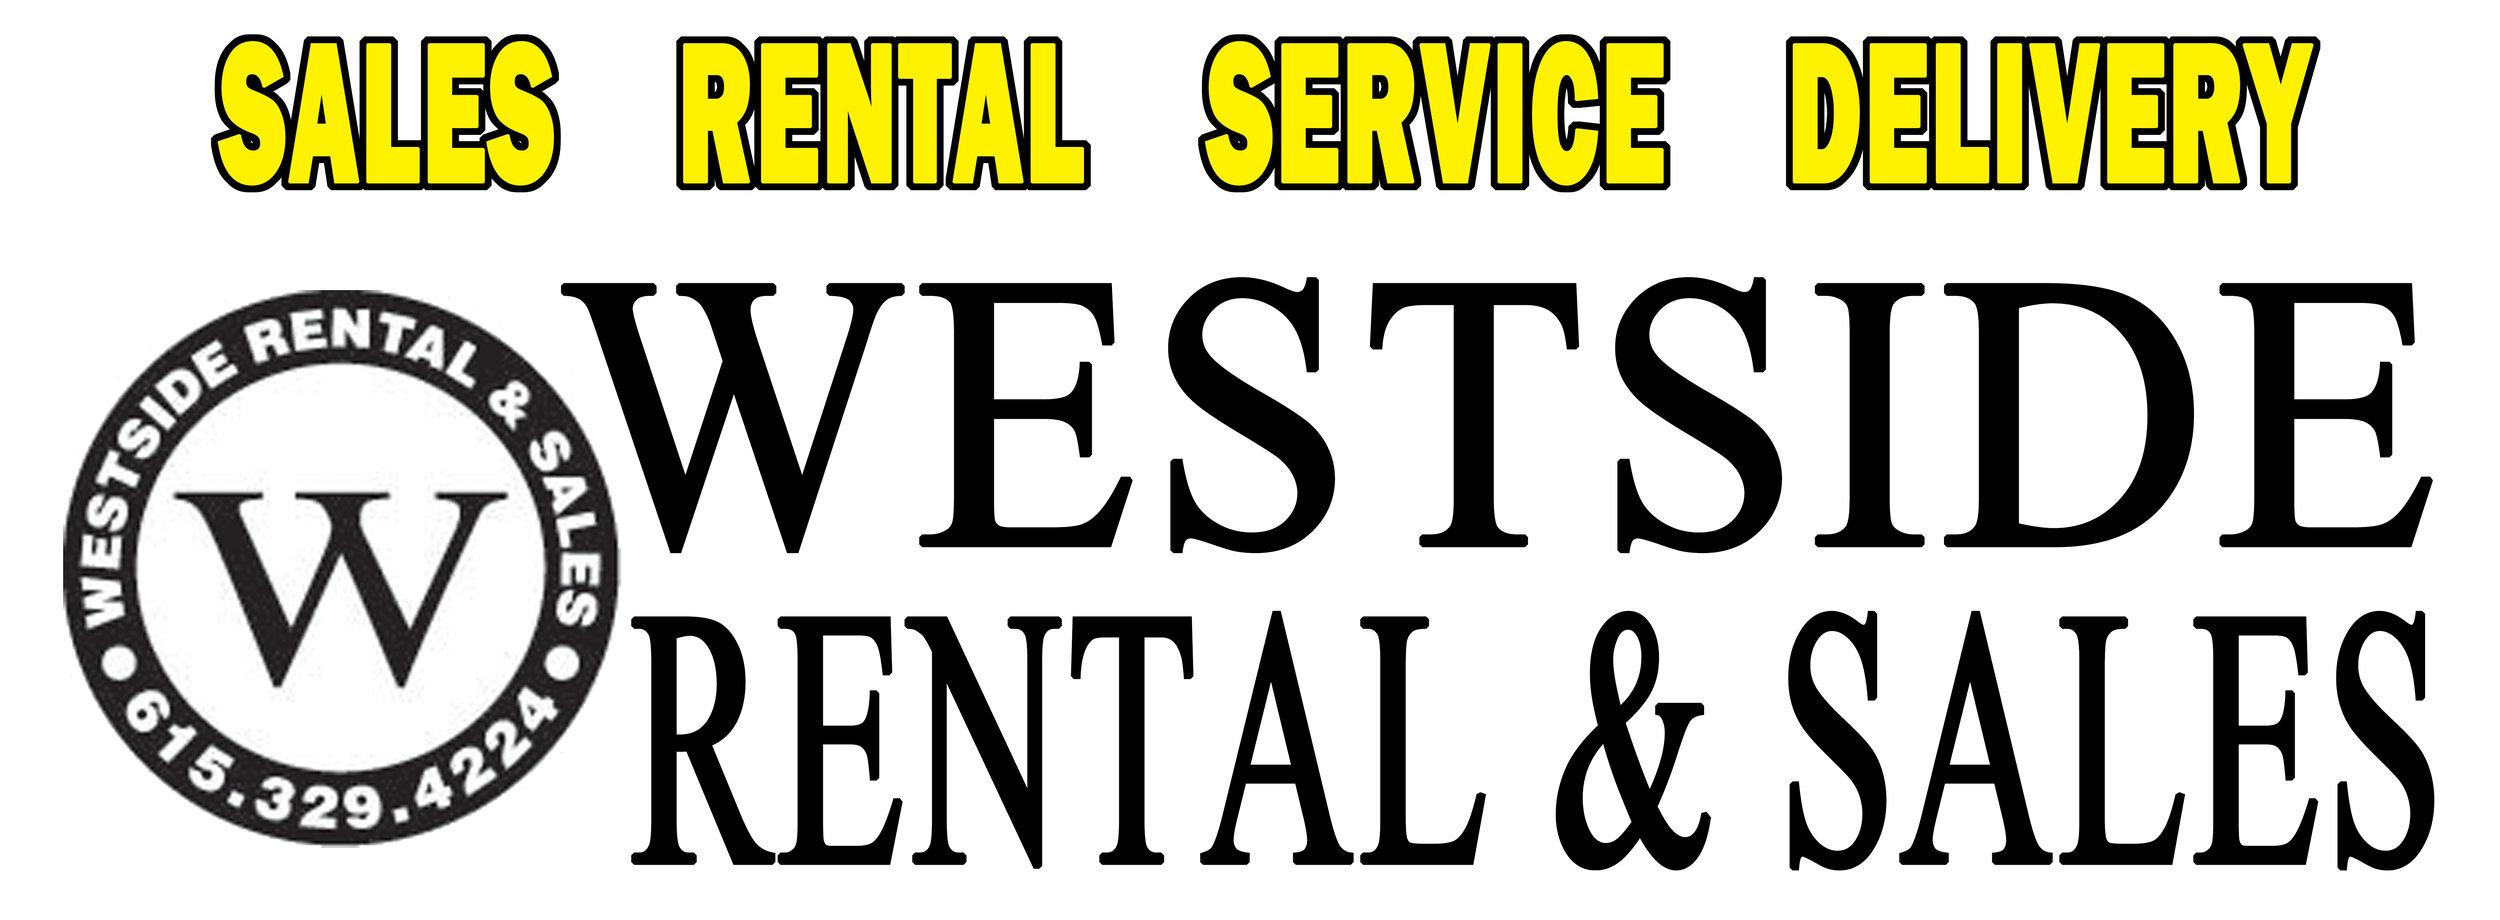 logo Westside Rentals 4X3 SCHOOL BANNER.jpg